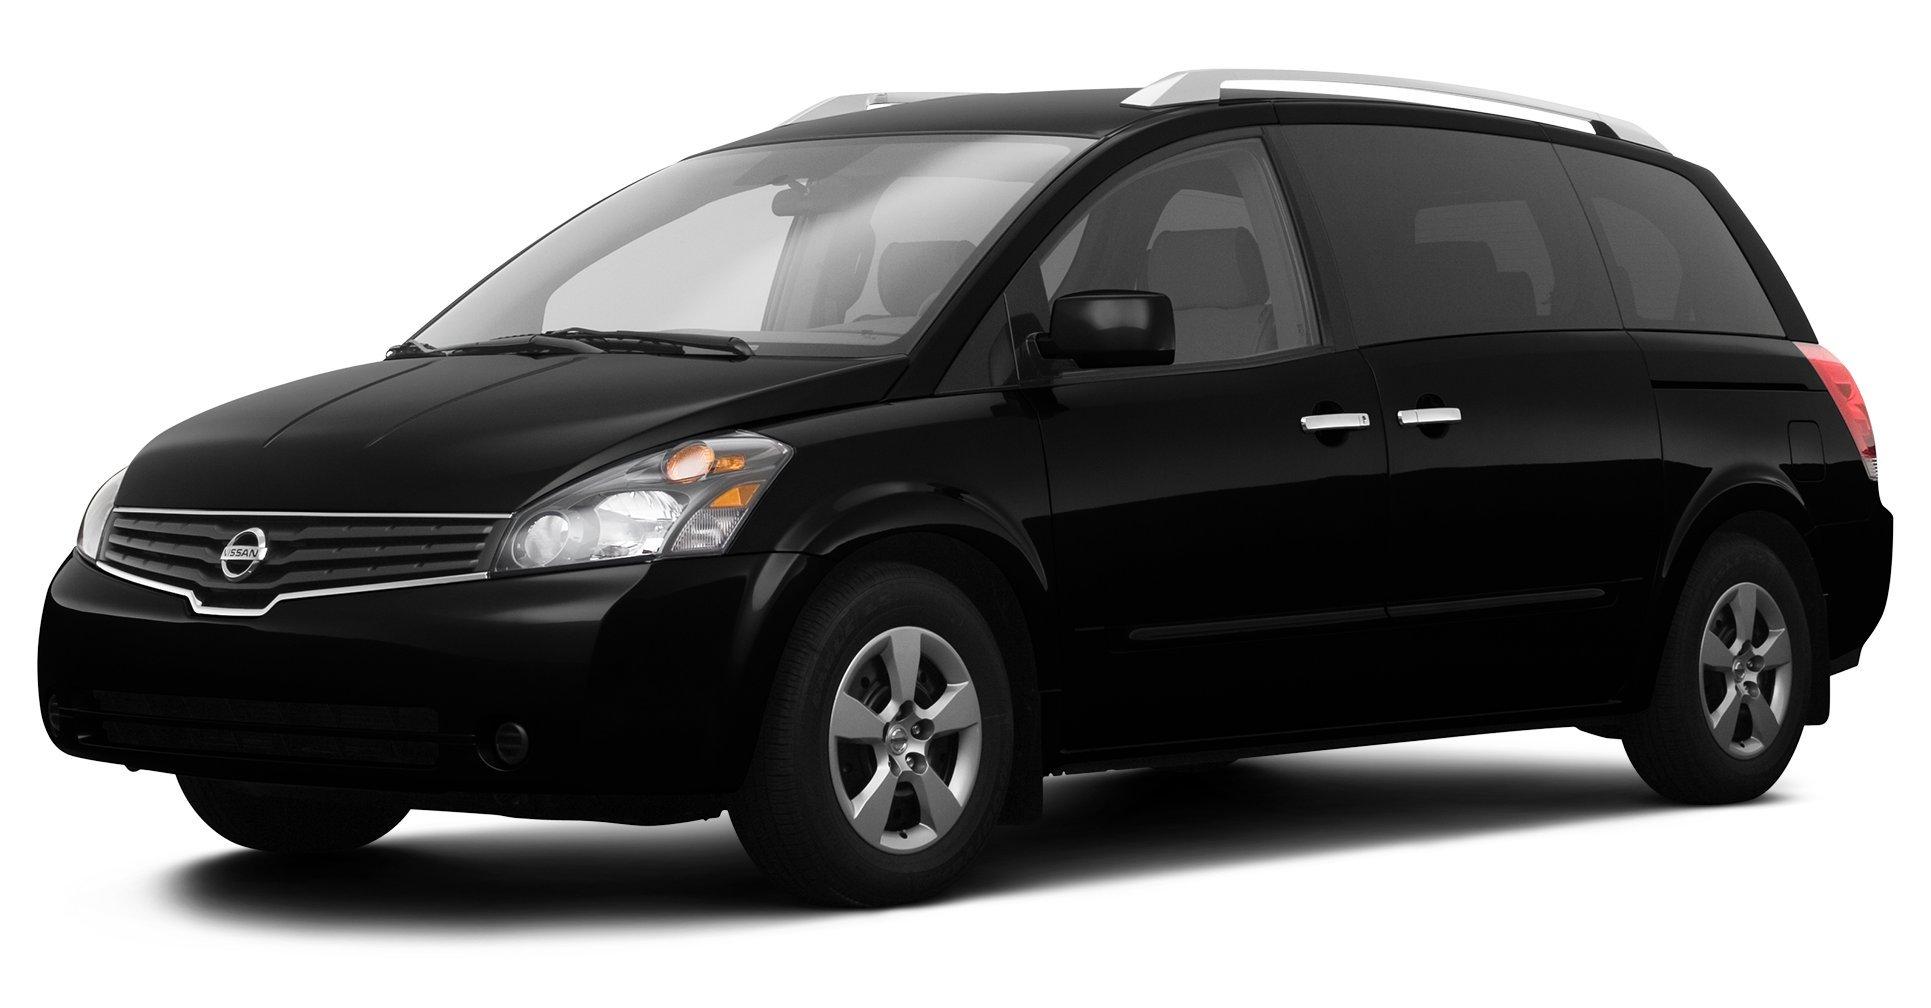 Toyota Sienna Service Manual: Laser sensor